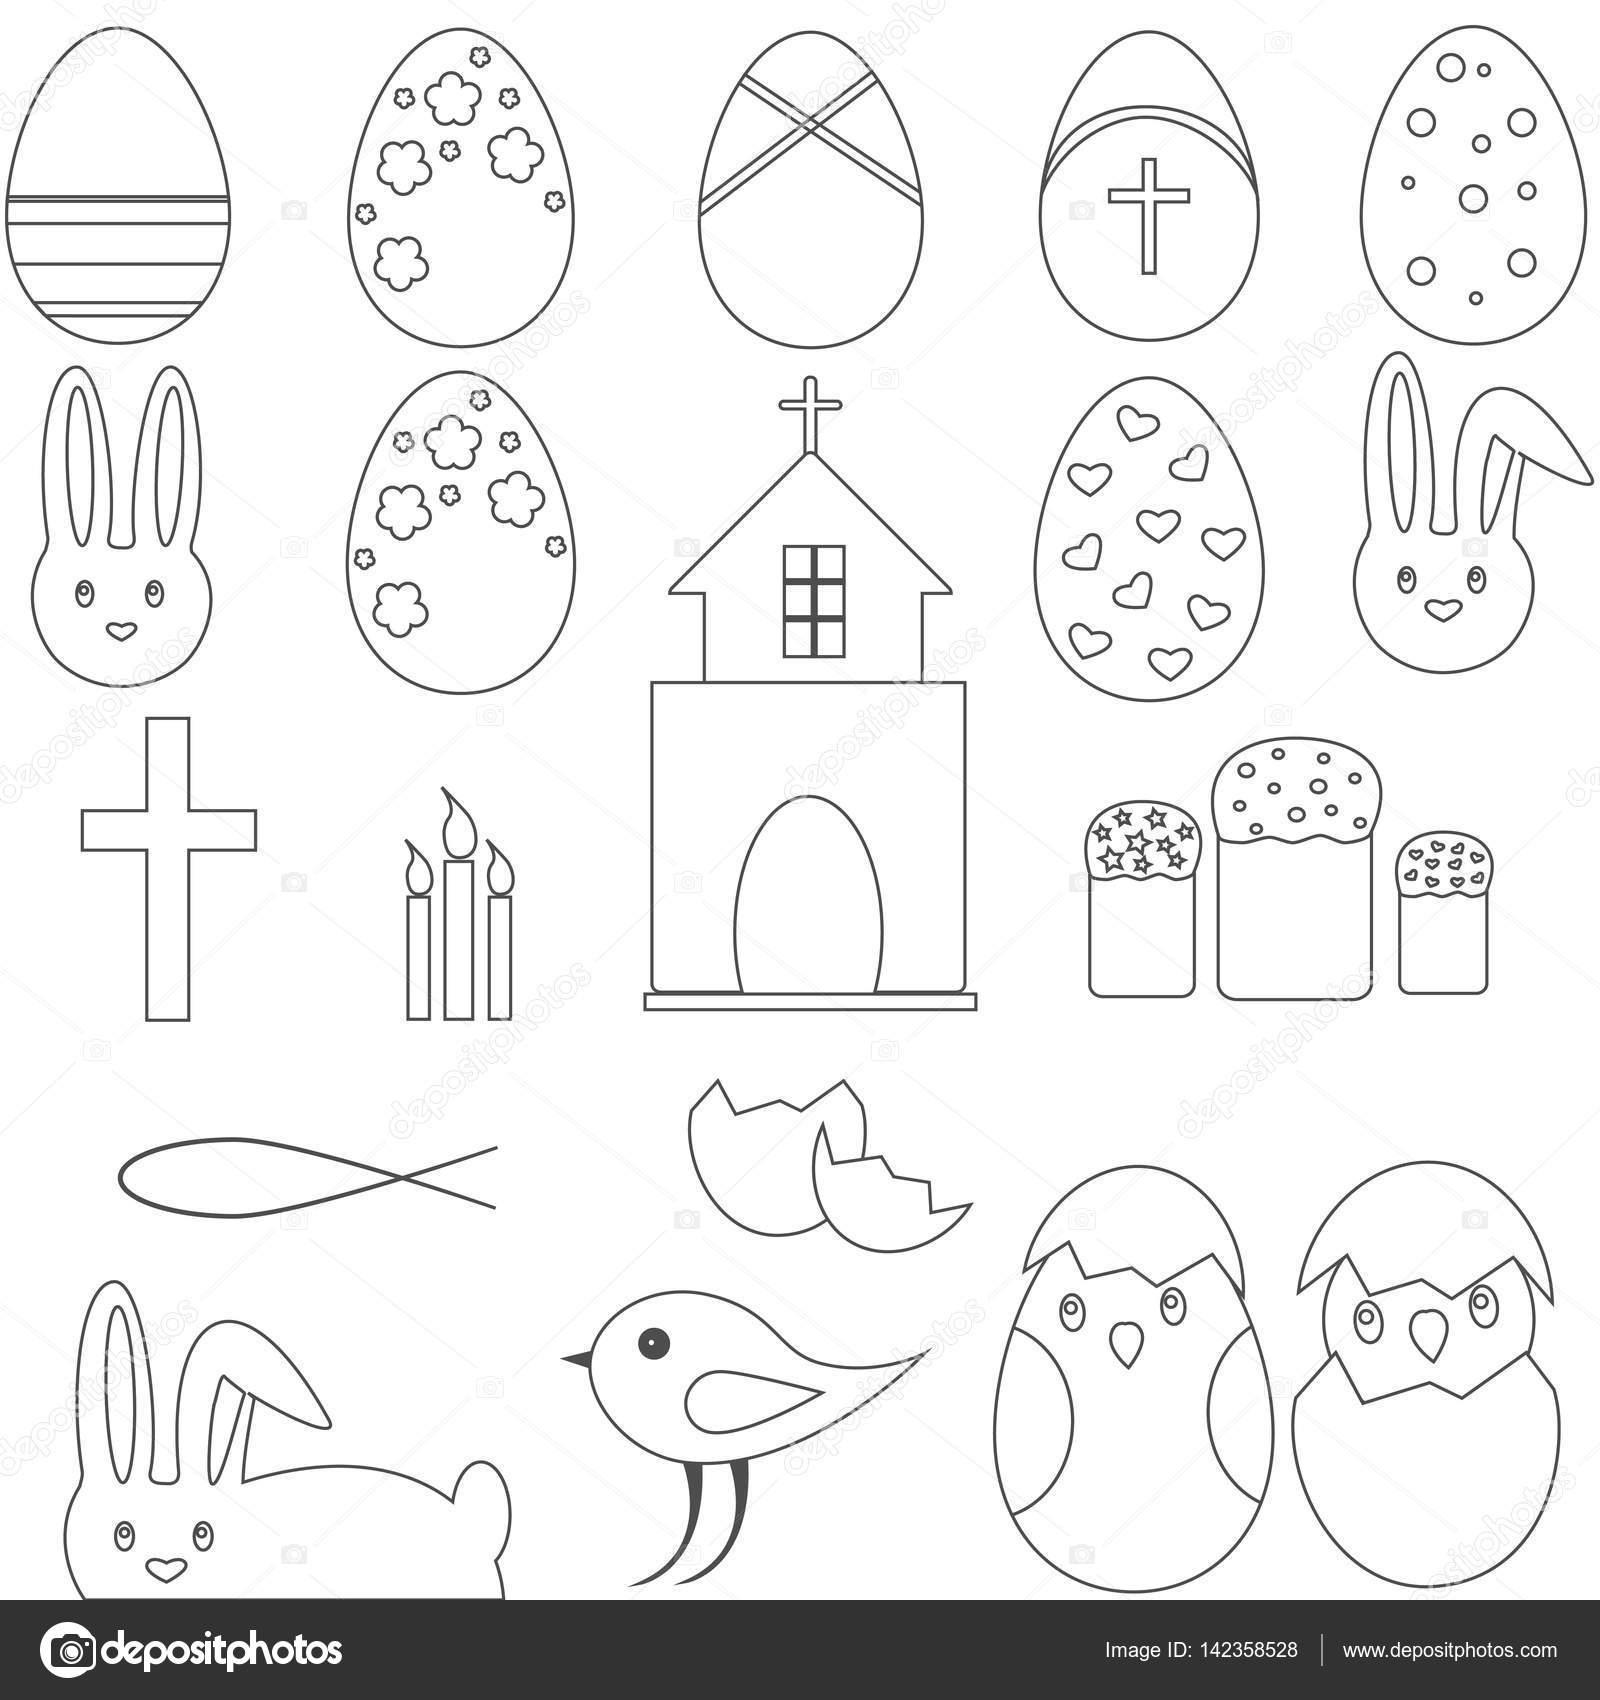 Christian Symbols Easter Eggs Bunny Stock Vector Gyso4ka 142358528